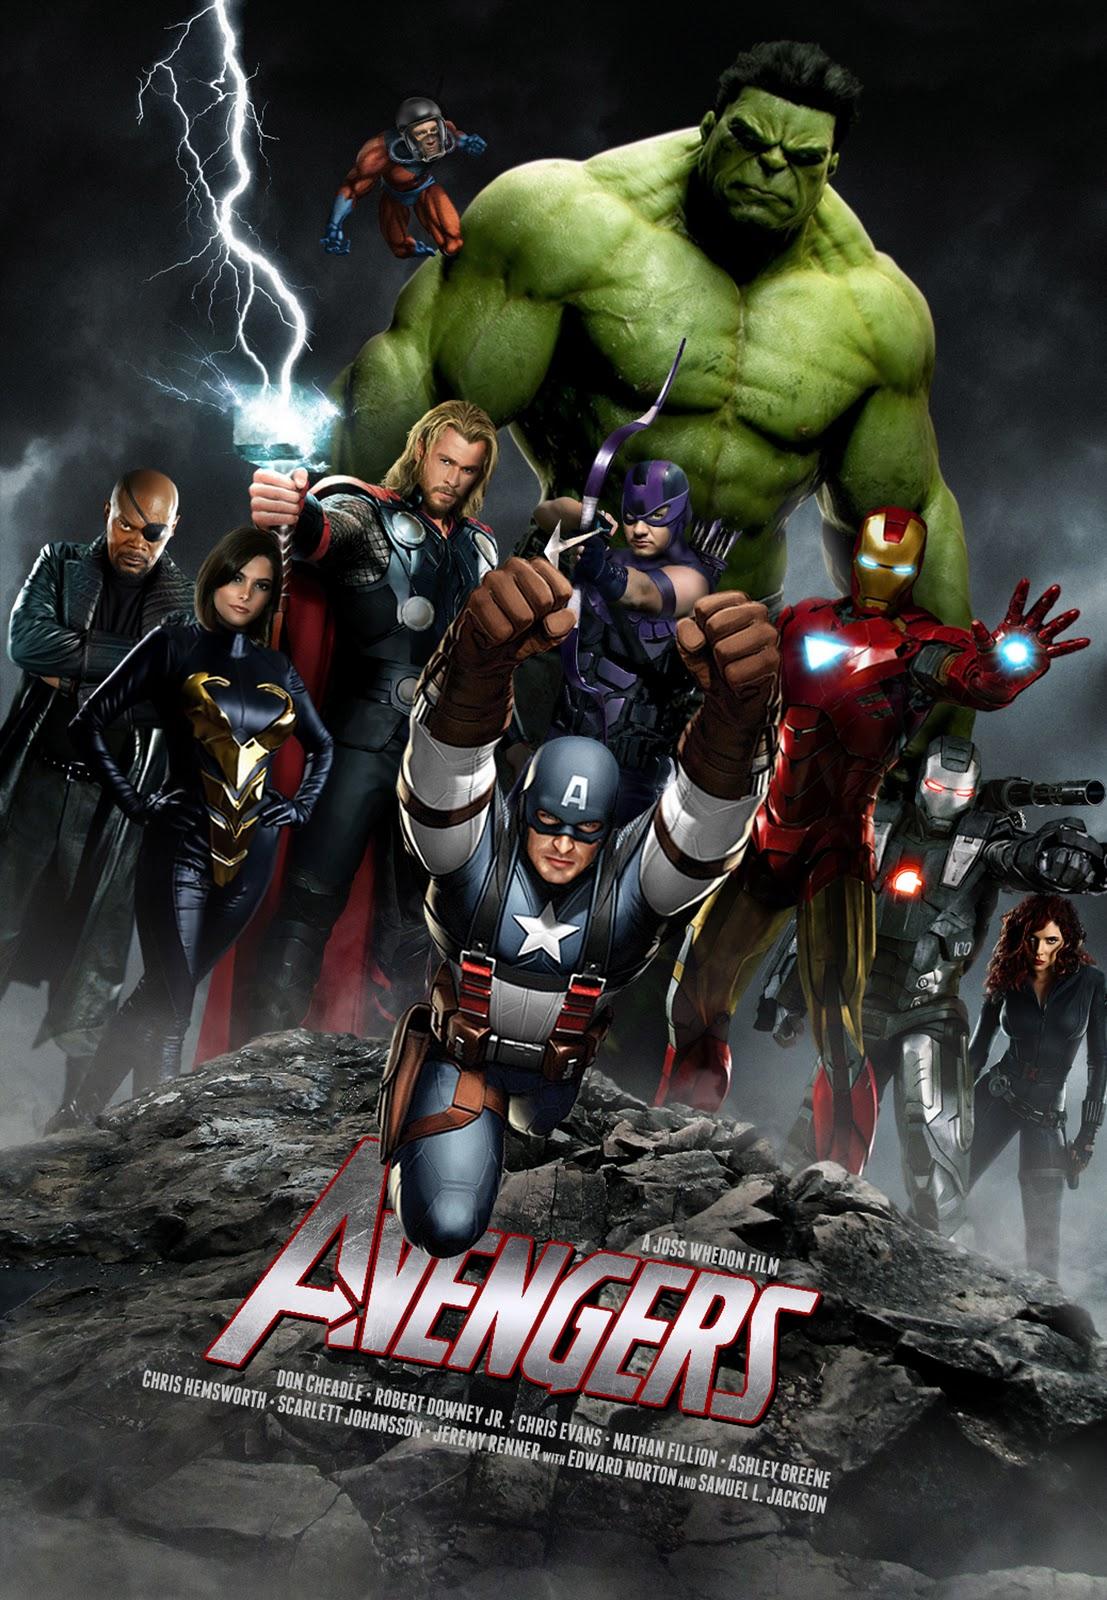 hinh-anh-sieu-anh-hung-the-avengers-Super-hero-6